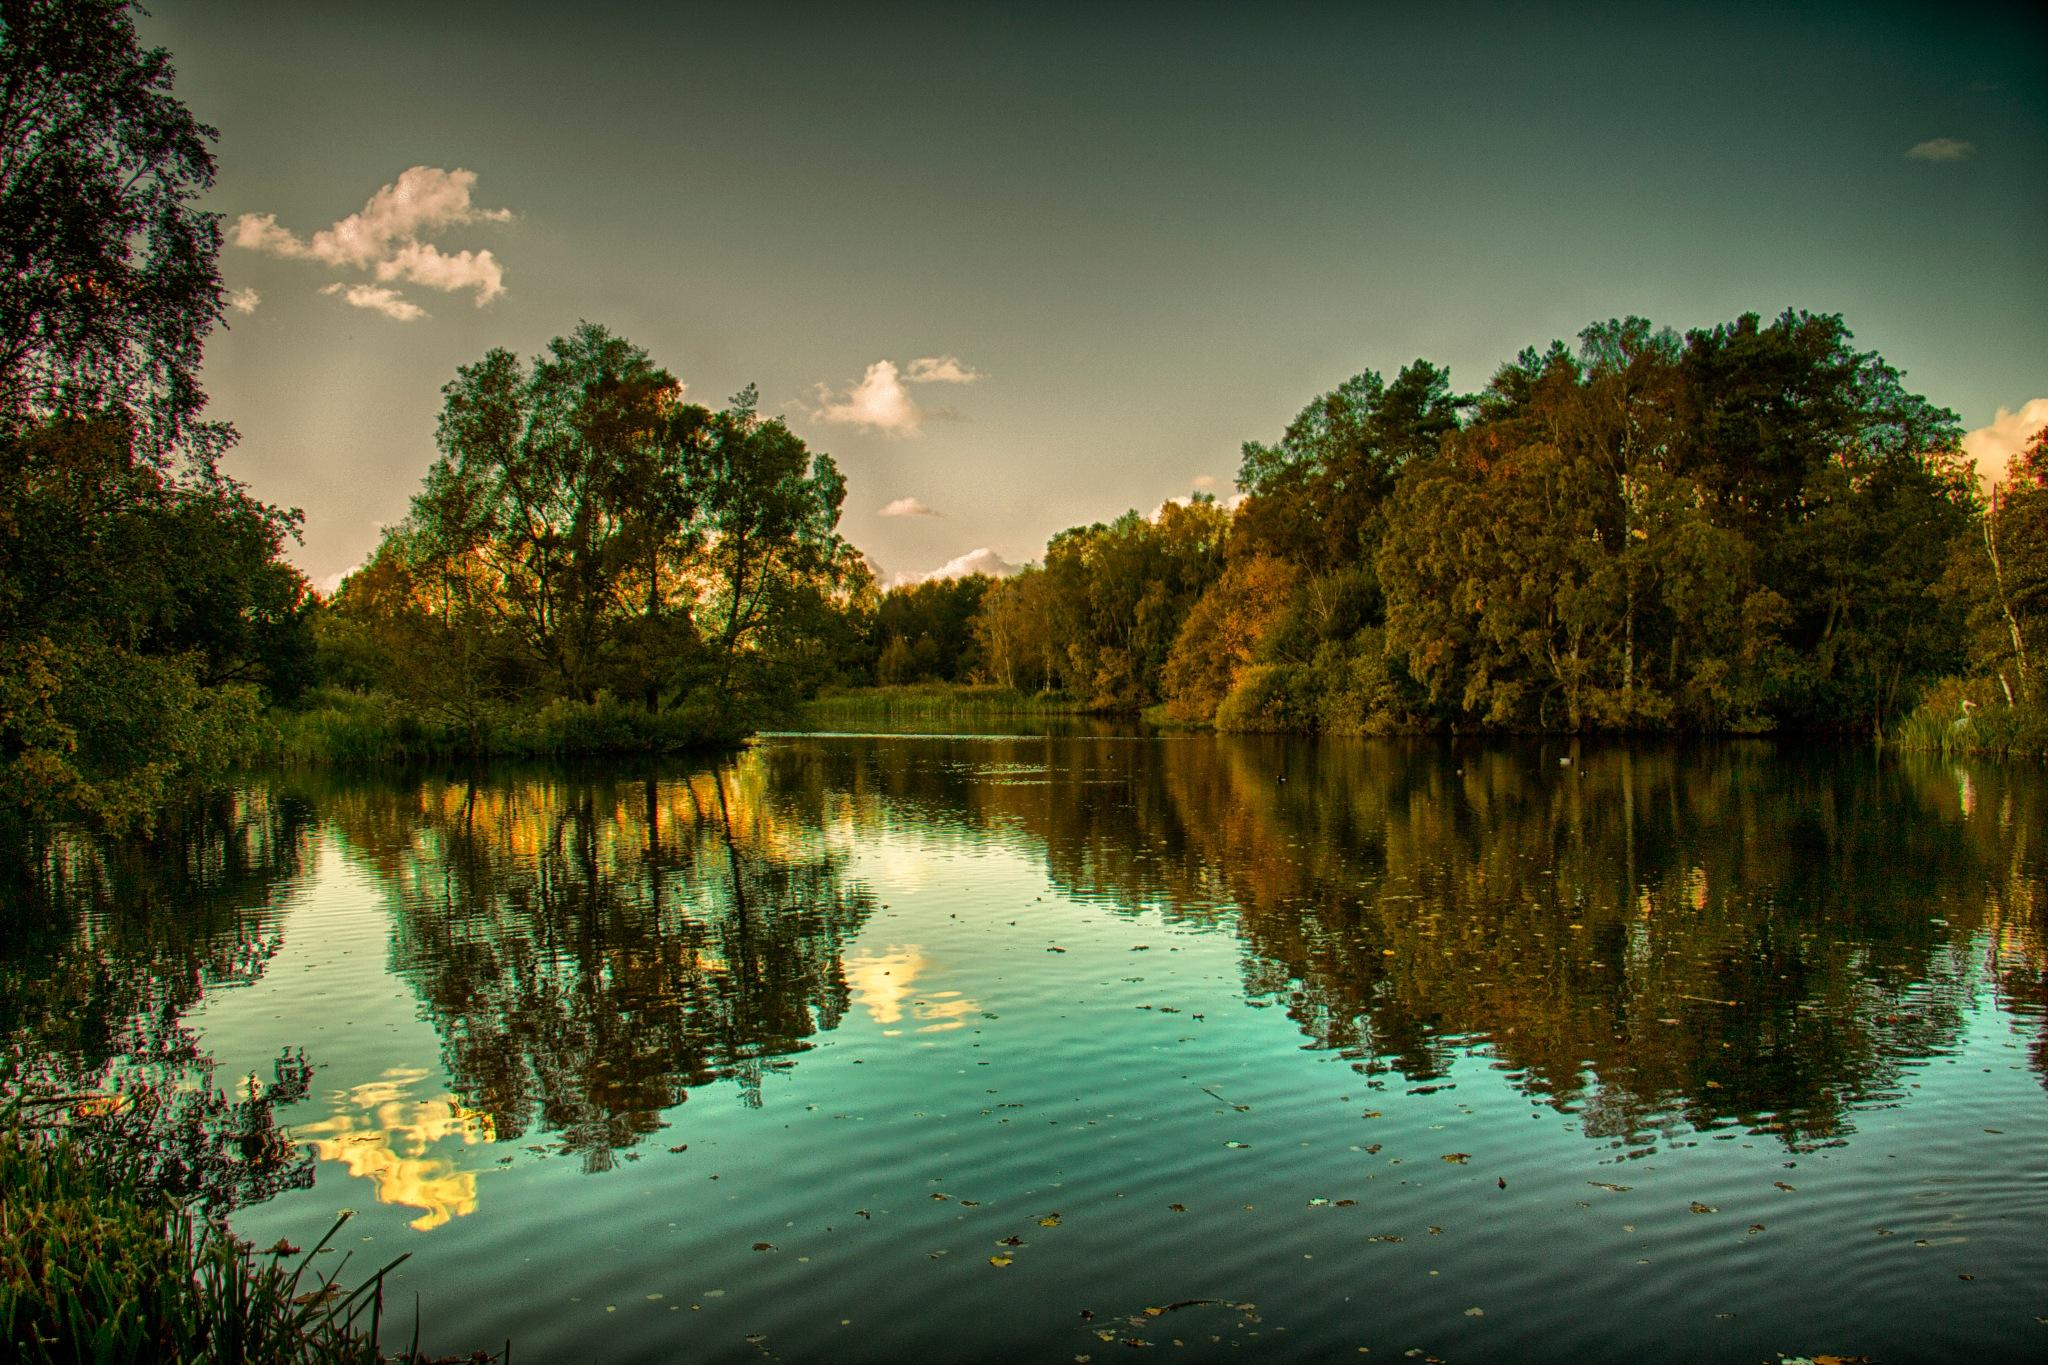 Pensthorpe Lake by chrisbryan1974